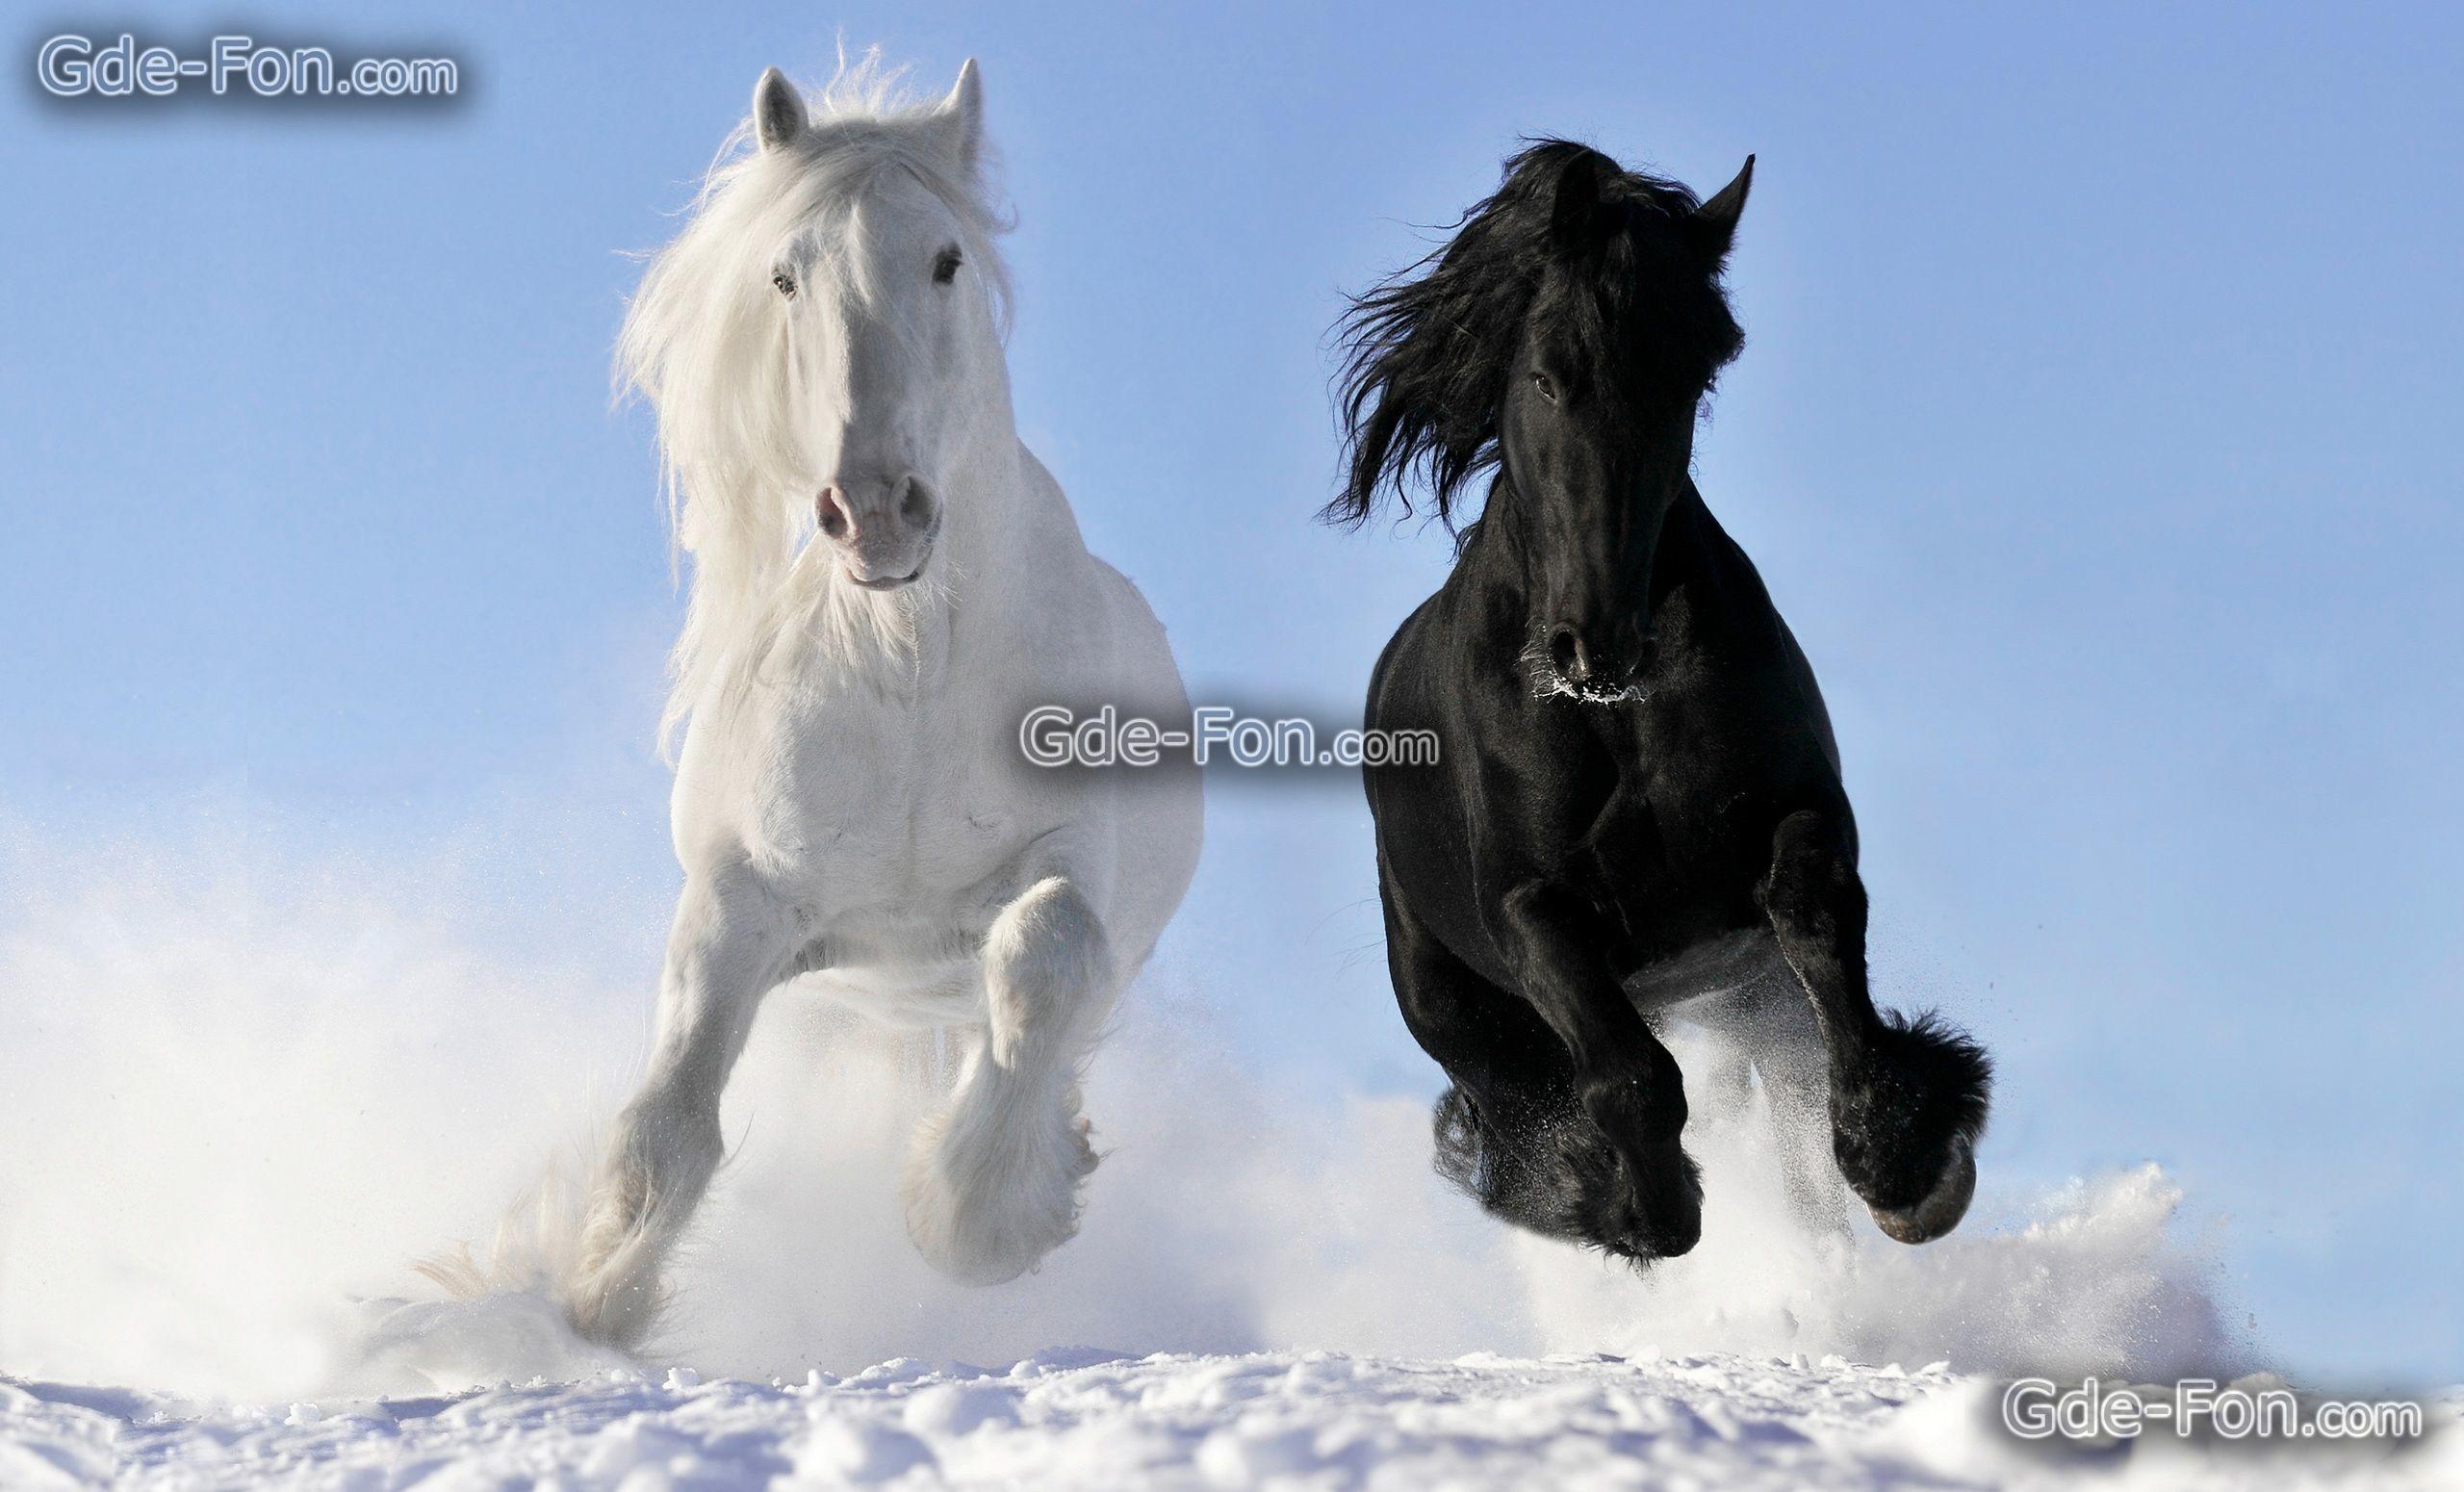 Utiful Wild Horses Wallpaper Black And White Horses 2560x1550 Download Hd Wallpaper Wallpapertip